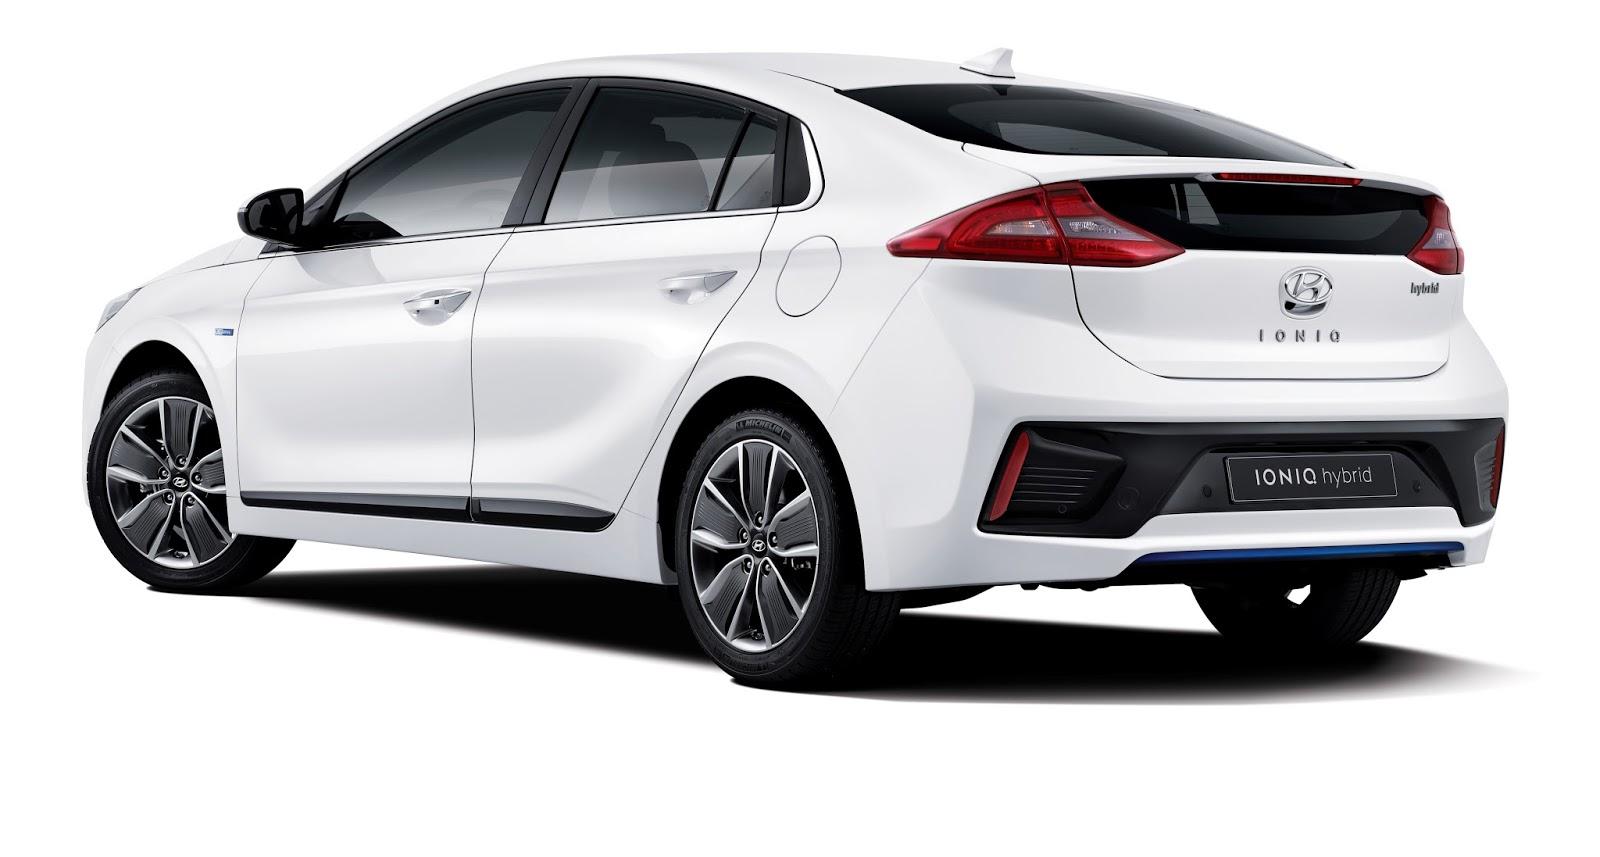 H Hyundai μας παρουσιάζει την προηγμένη υβριδική της τεχνολογία